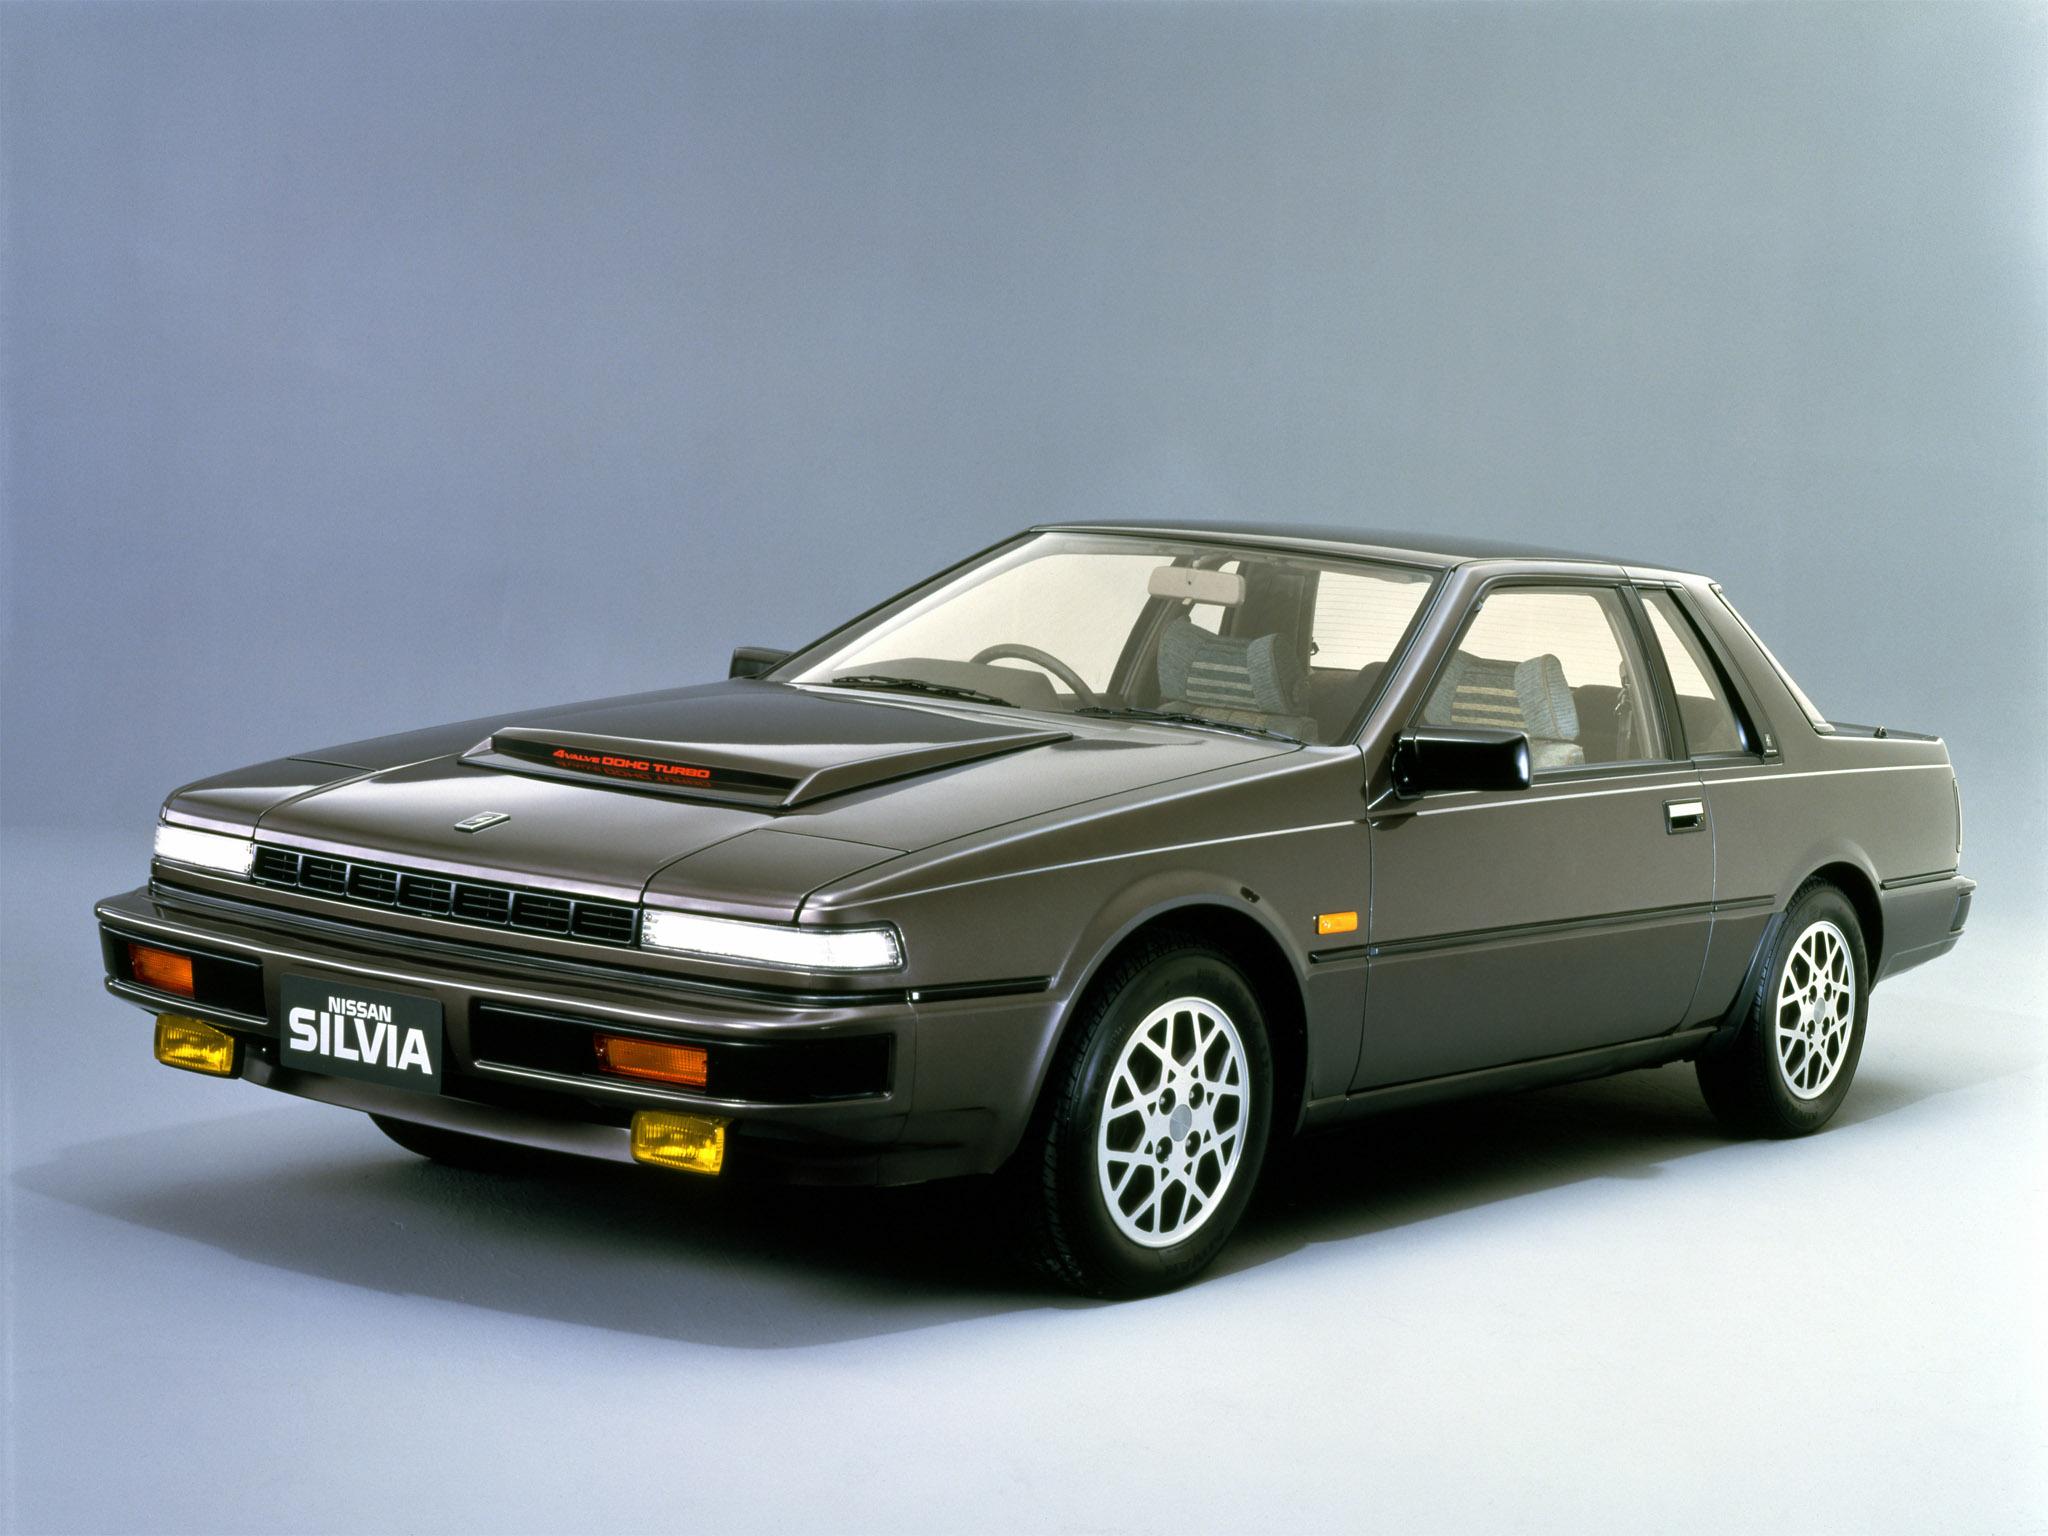 Nissan Silvia IV (S12) 1983 - 1988 Coupe #5